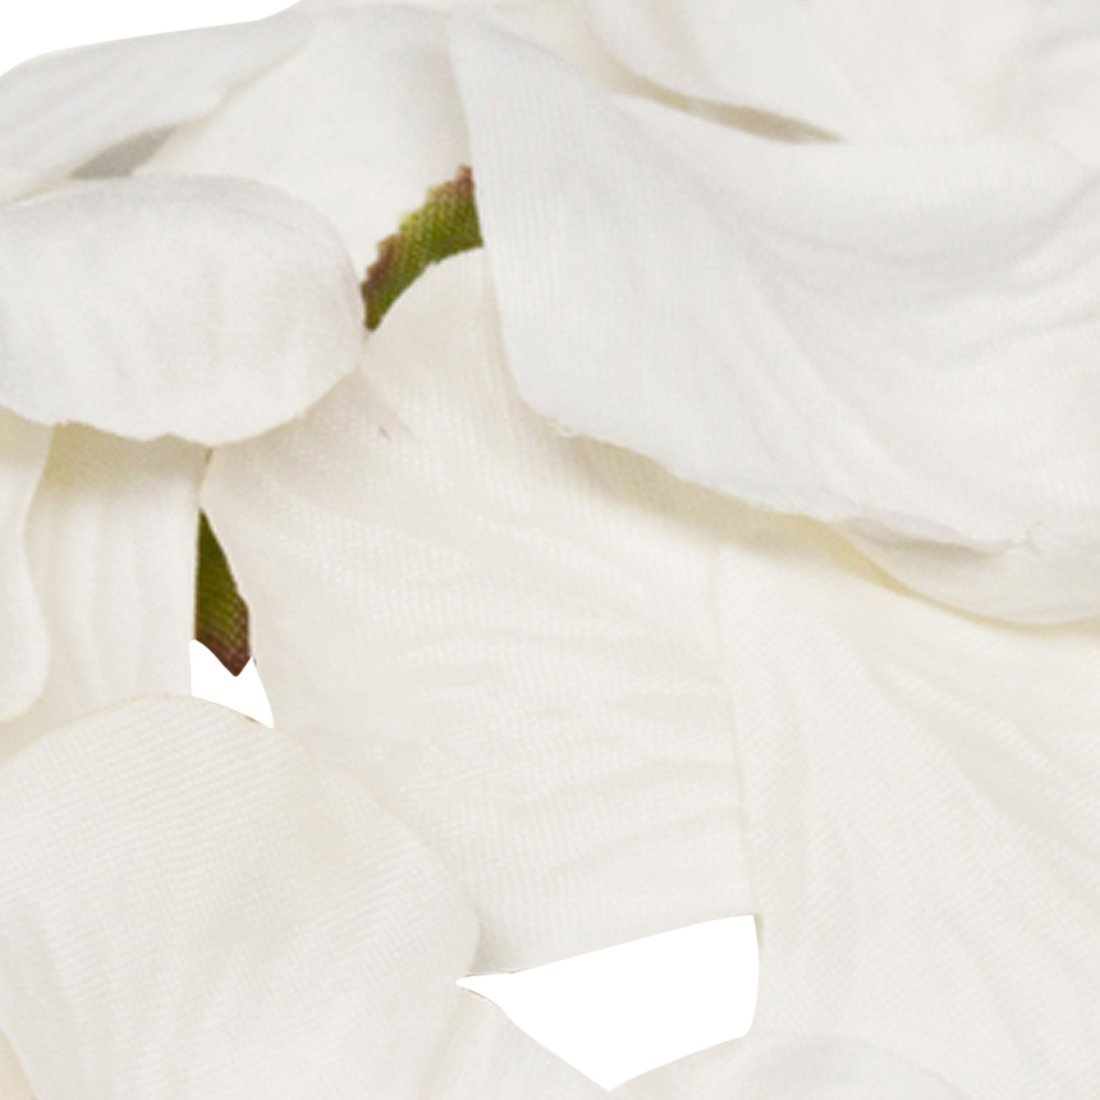 Box 25 ivory organza 7 x 5cm bags dried red rose petals wedding confetti throws